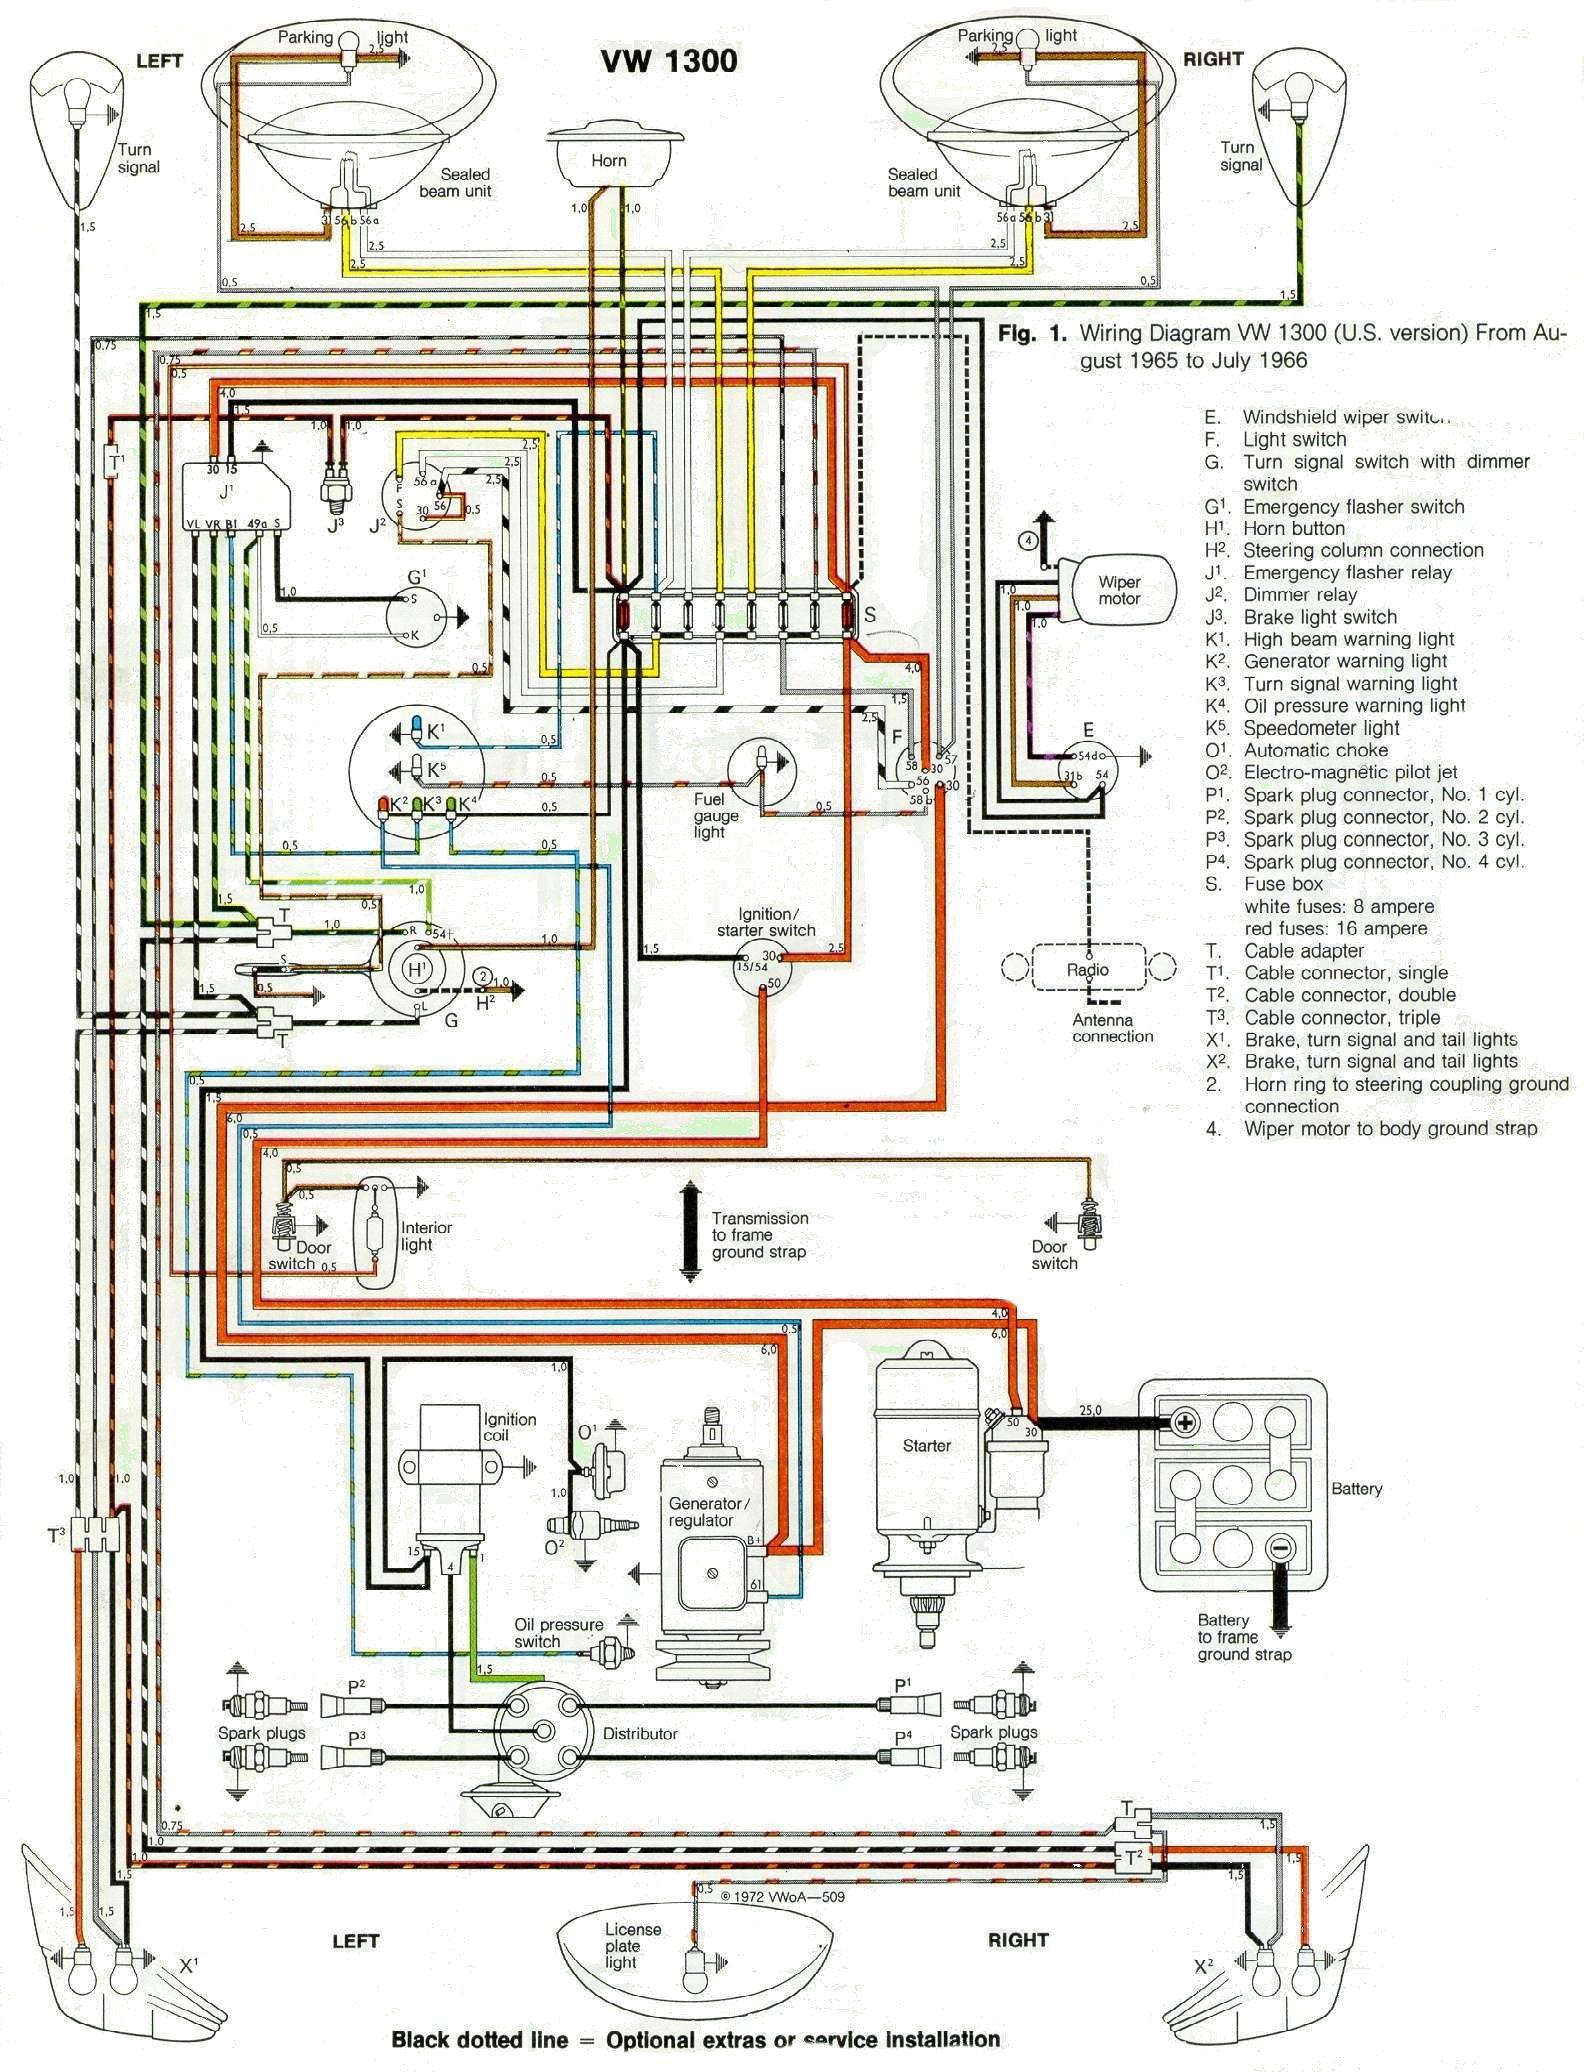 hight resolution of 1966 wiring diagram cox pinterest diagram beetles and vw rh pinterest com vw wiring harness diagram